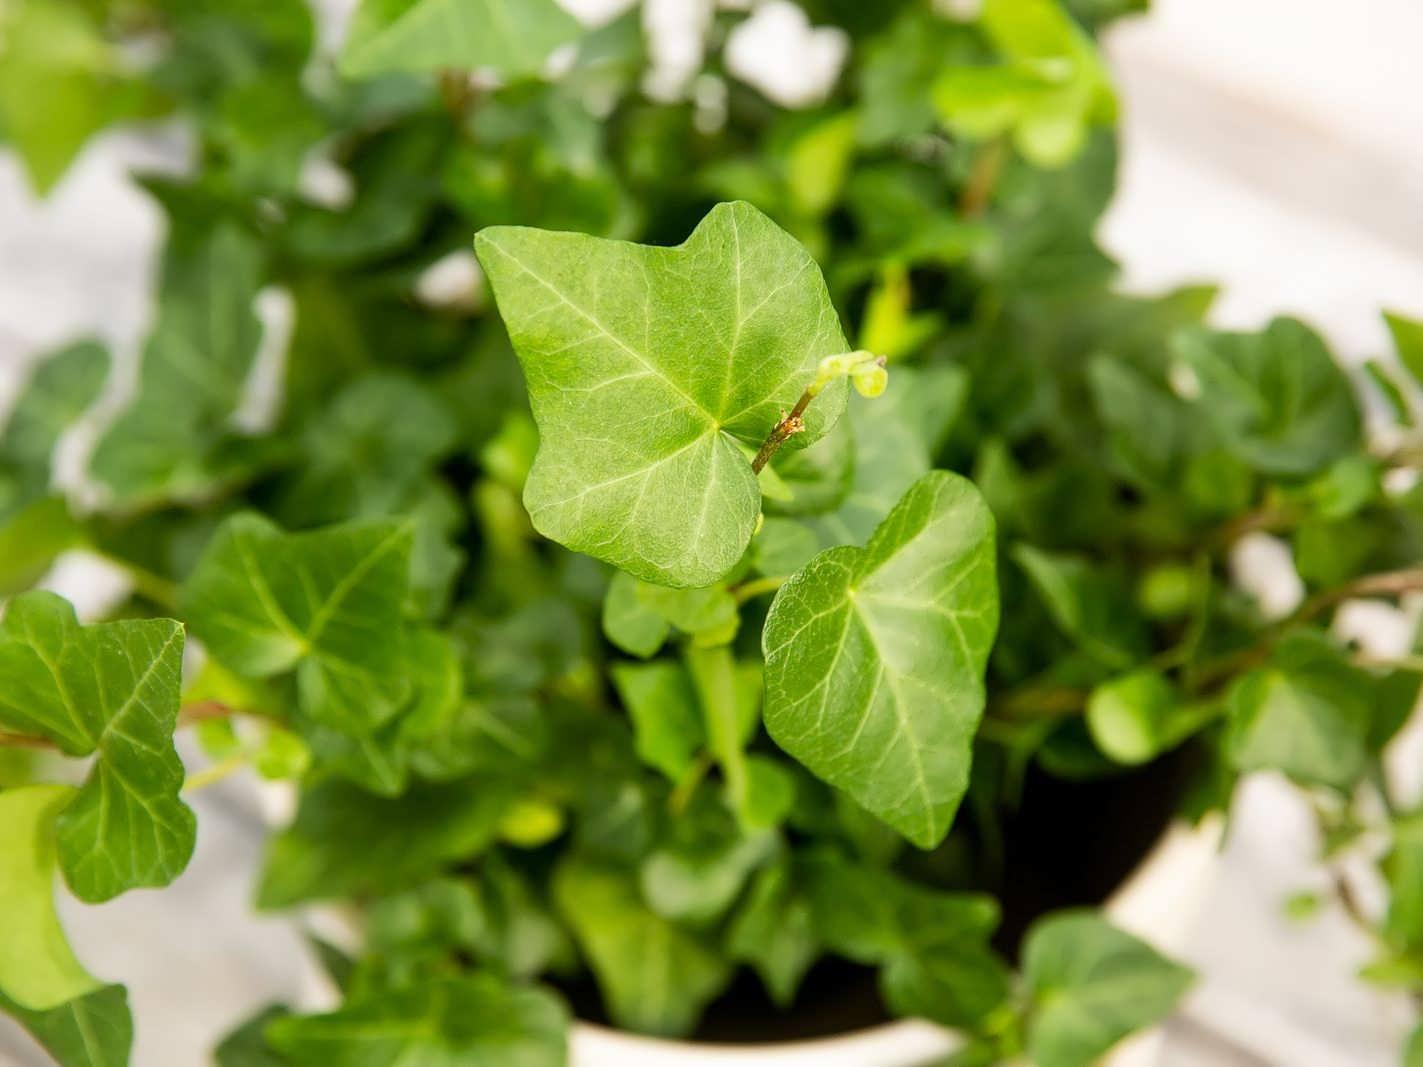 Planting English ivy 5 - کاشت پیچک انگلیسی و شرایط مورد نیاز برای رشد آن